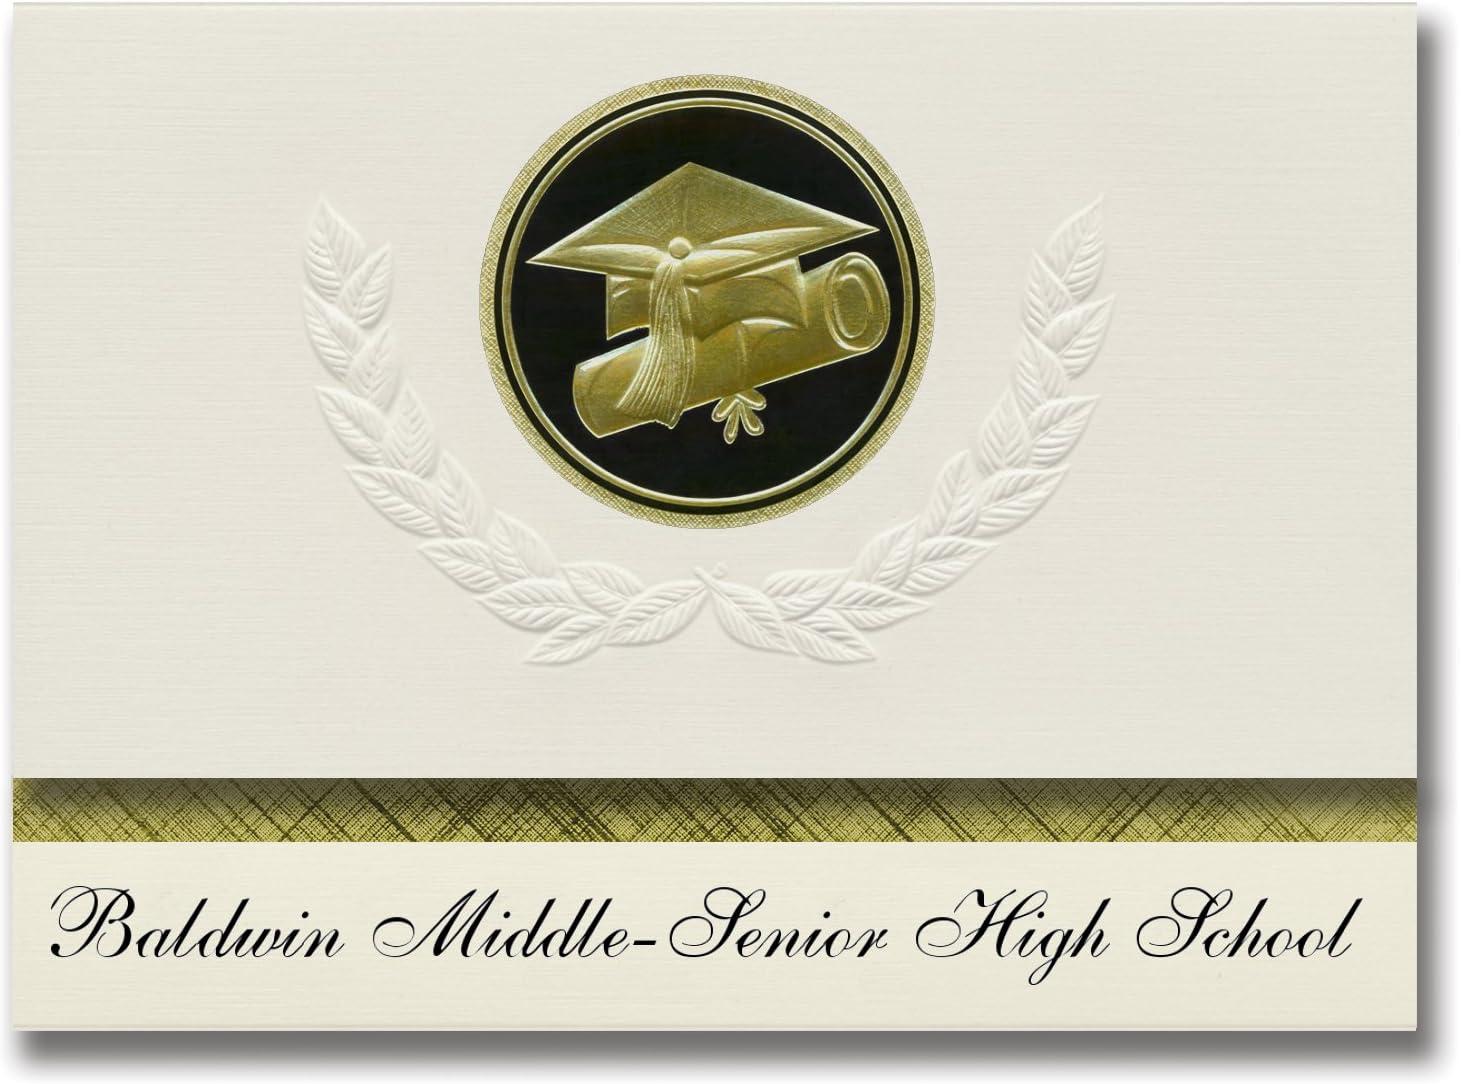 Signature Announcements Baldwin Middle-Senior High School (Baldwin, FL) Graduation Announcements, Presidential style, Elite package of 25 Cap & Diploma Seal. Black & Gold.